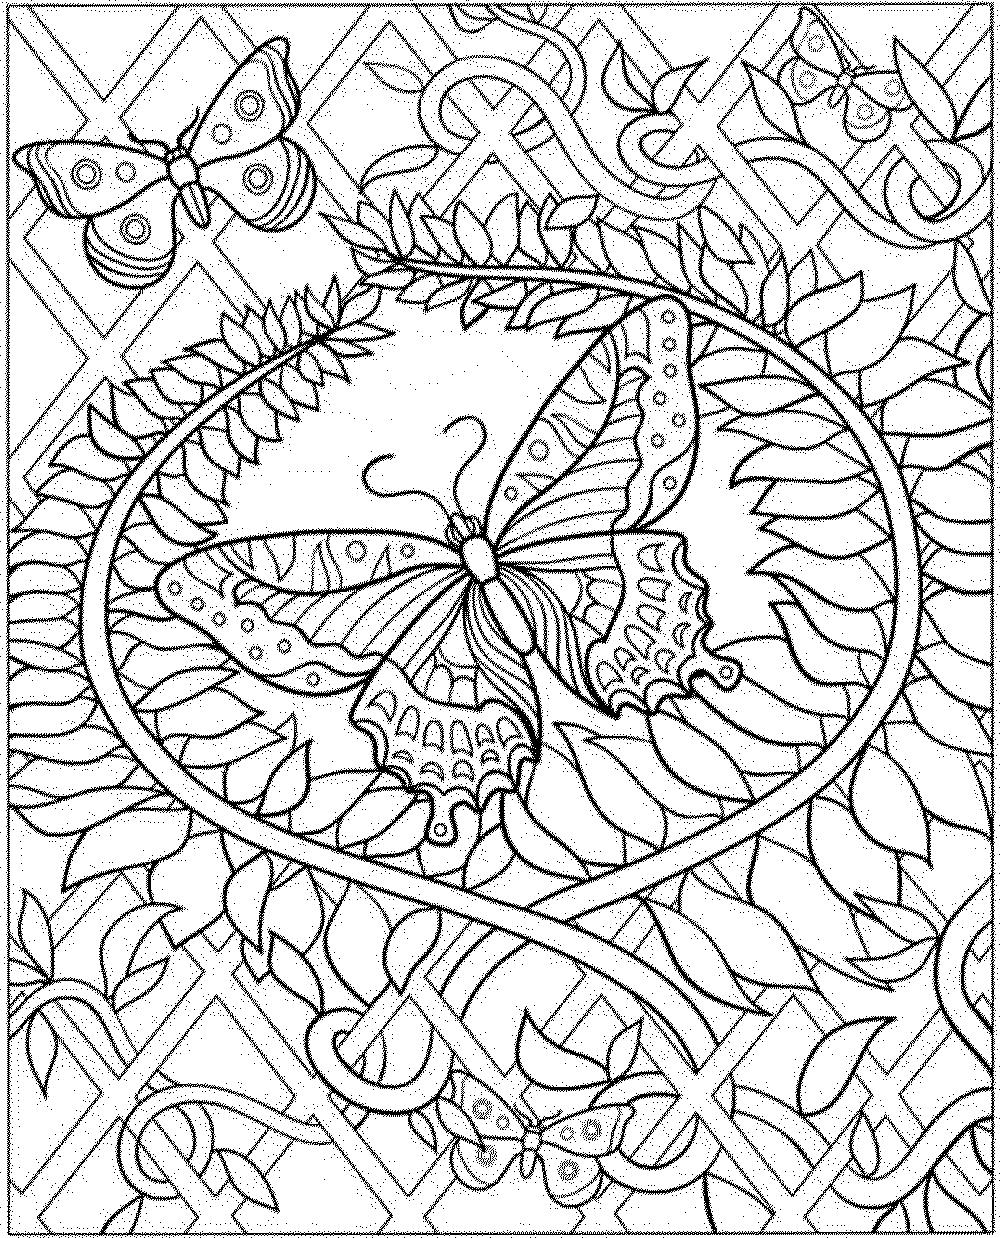 intricate coloring pages intricate coloring pages for adults coloring home coloring intricate pages